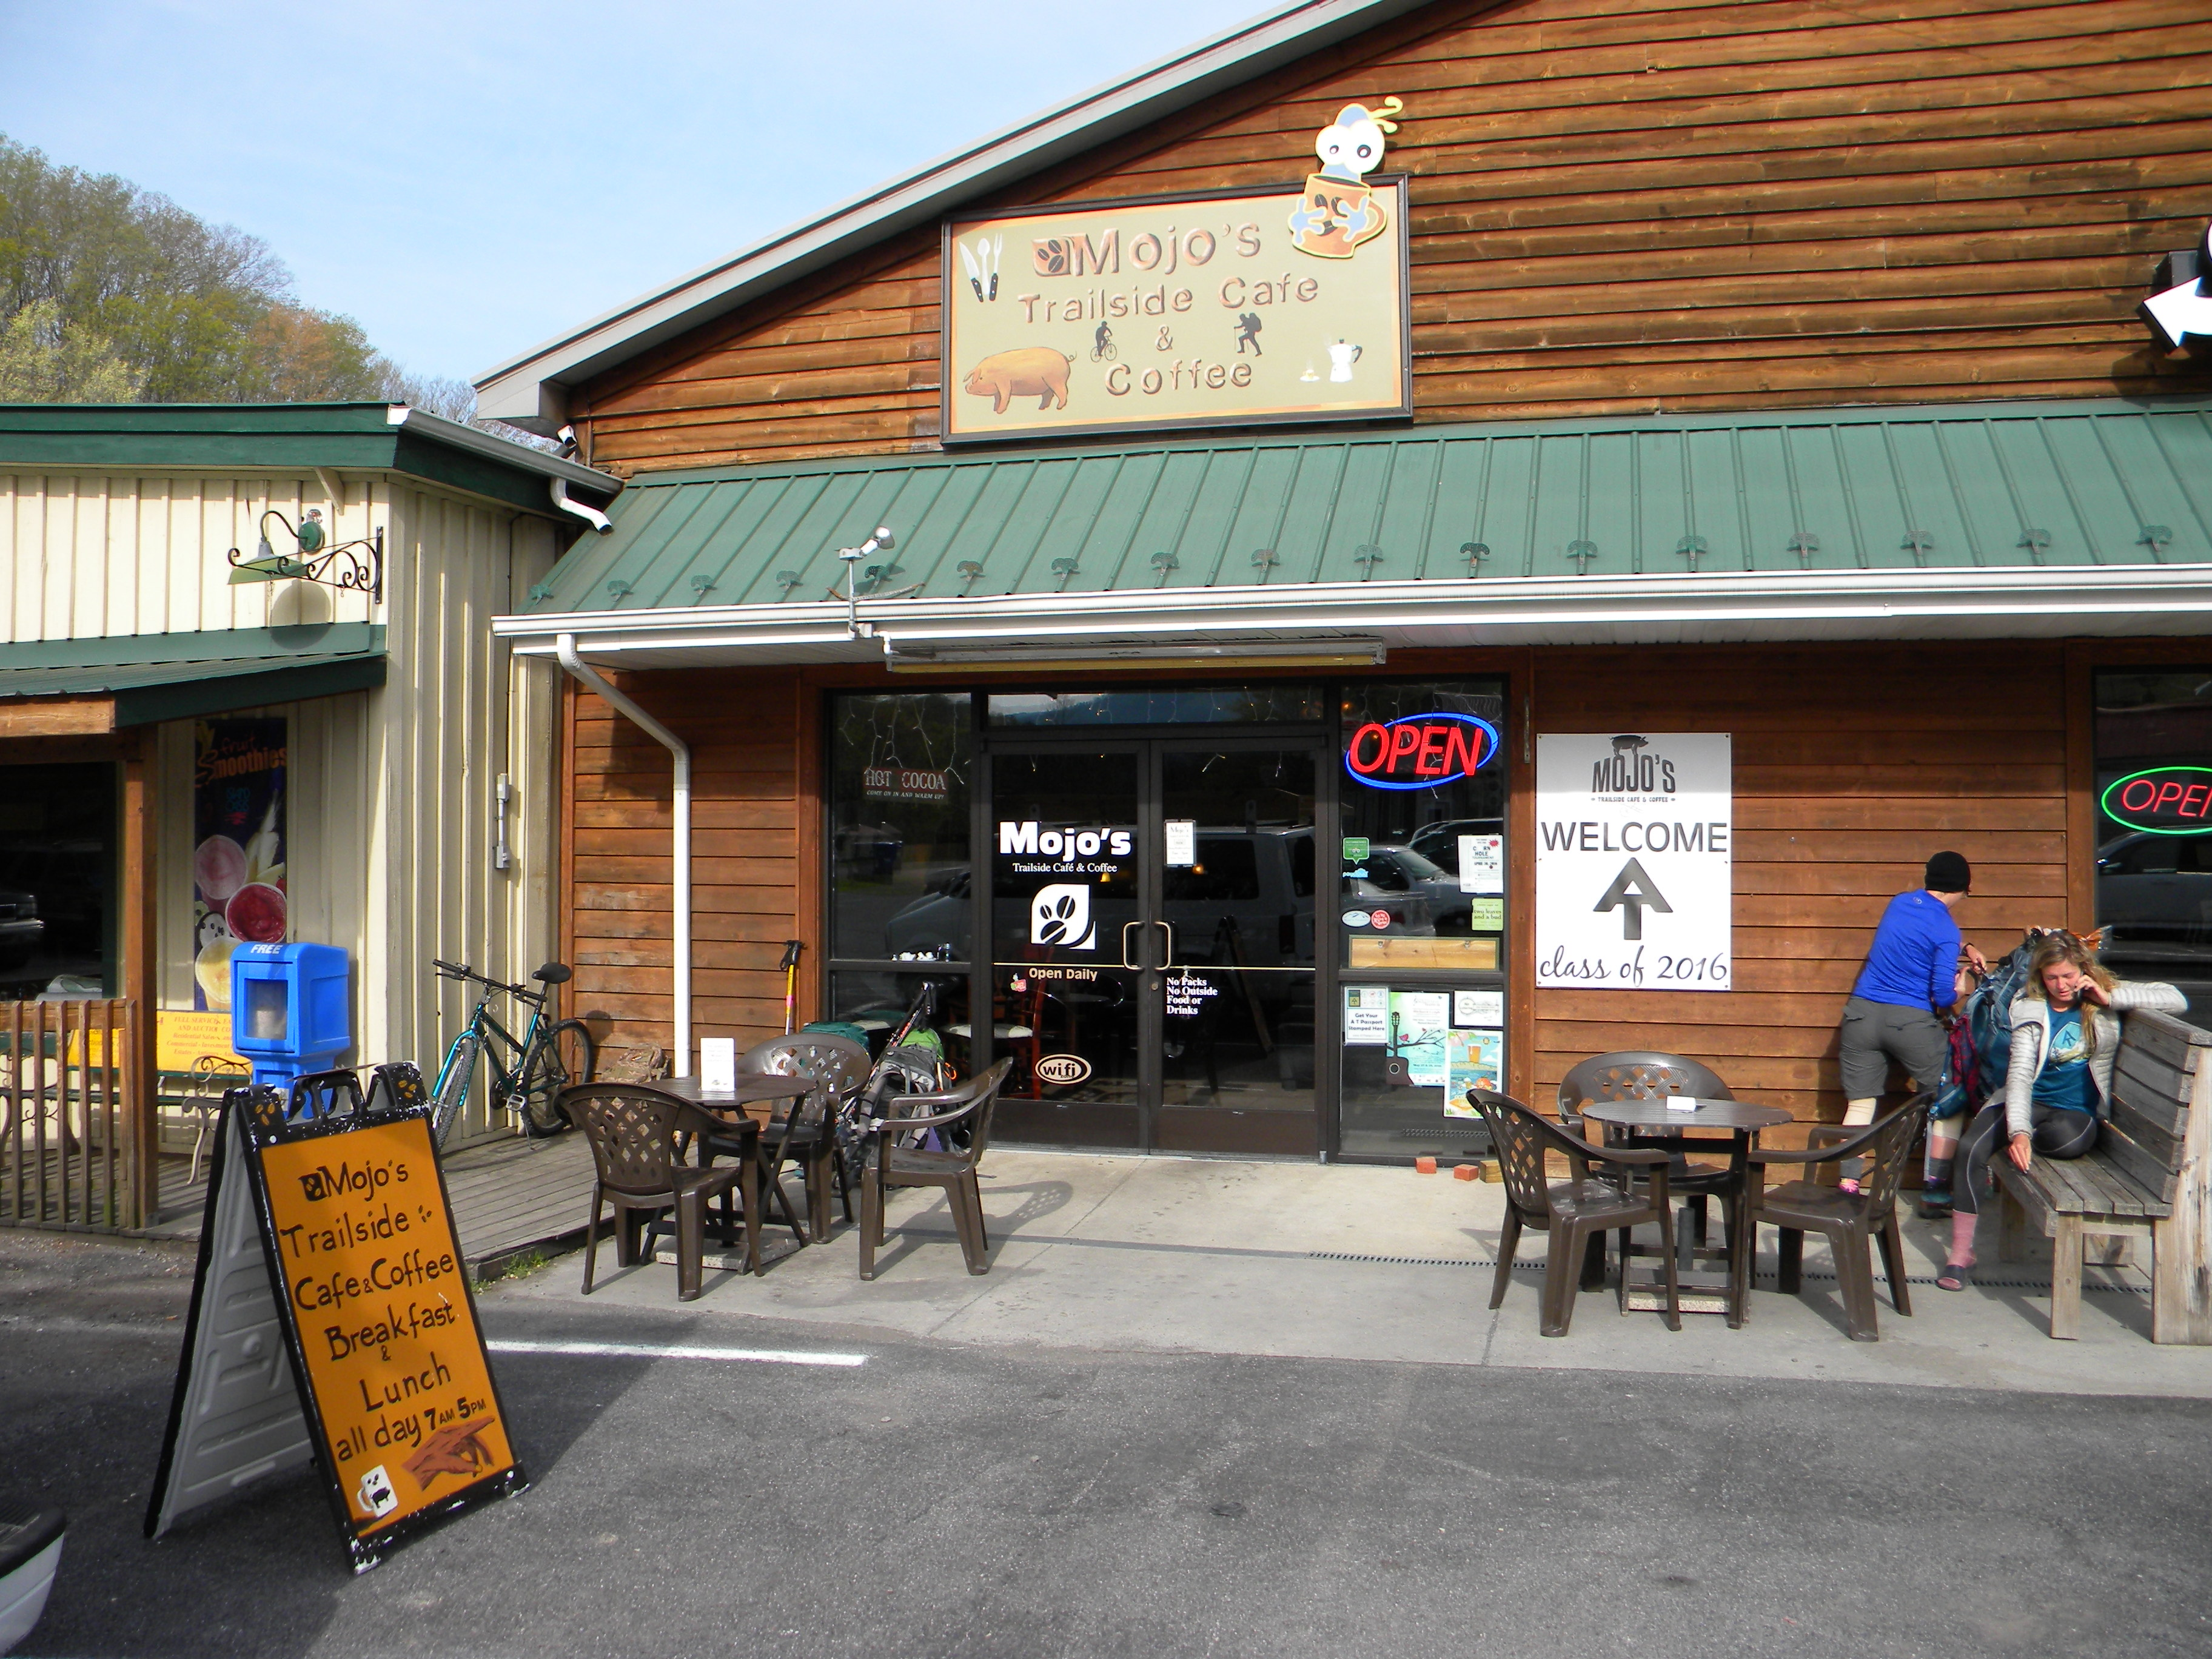 Mojo's Trailside Cafe & Coffee